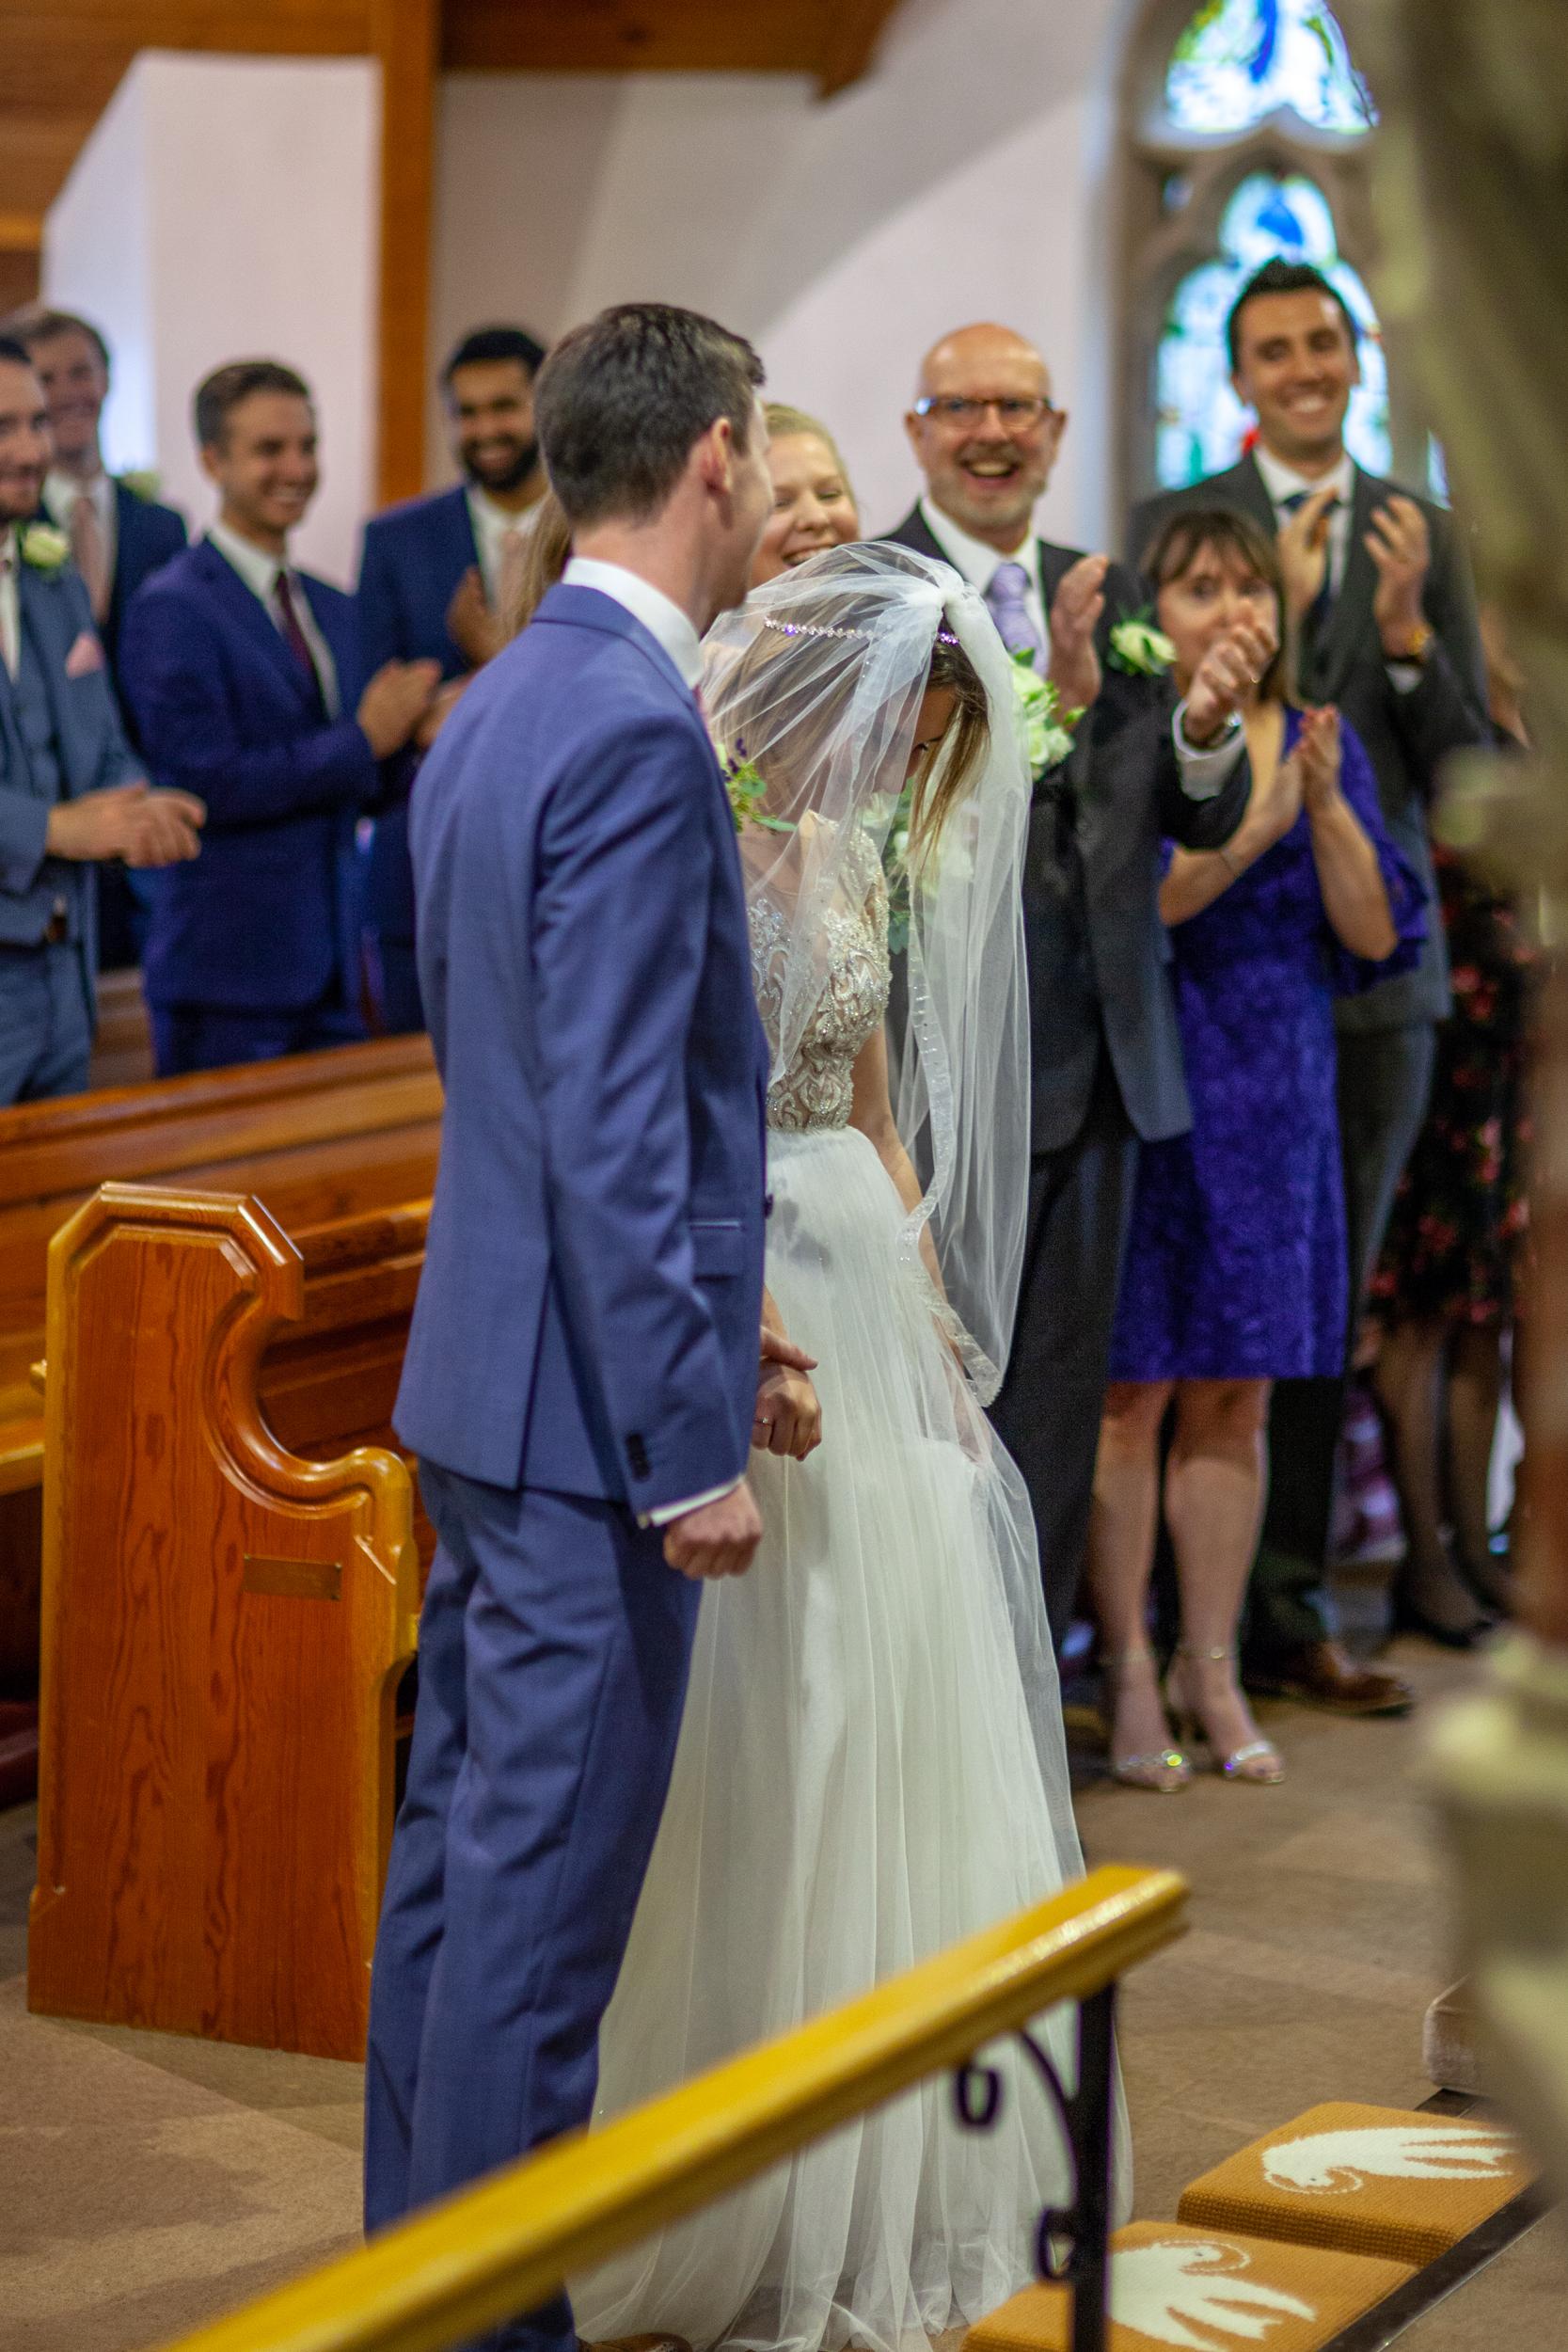 Charringworth-Manor-Wedding-Photography07.jpg